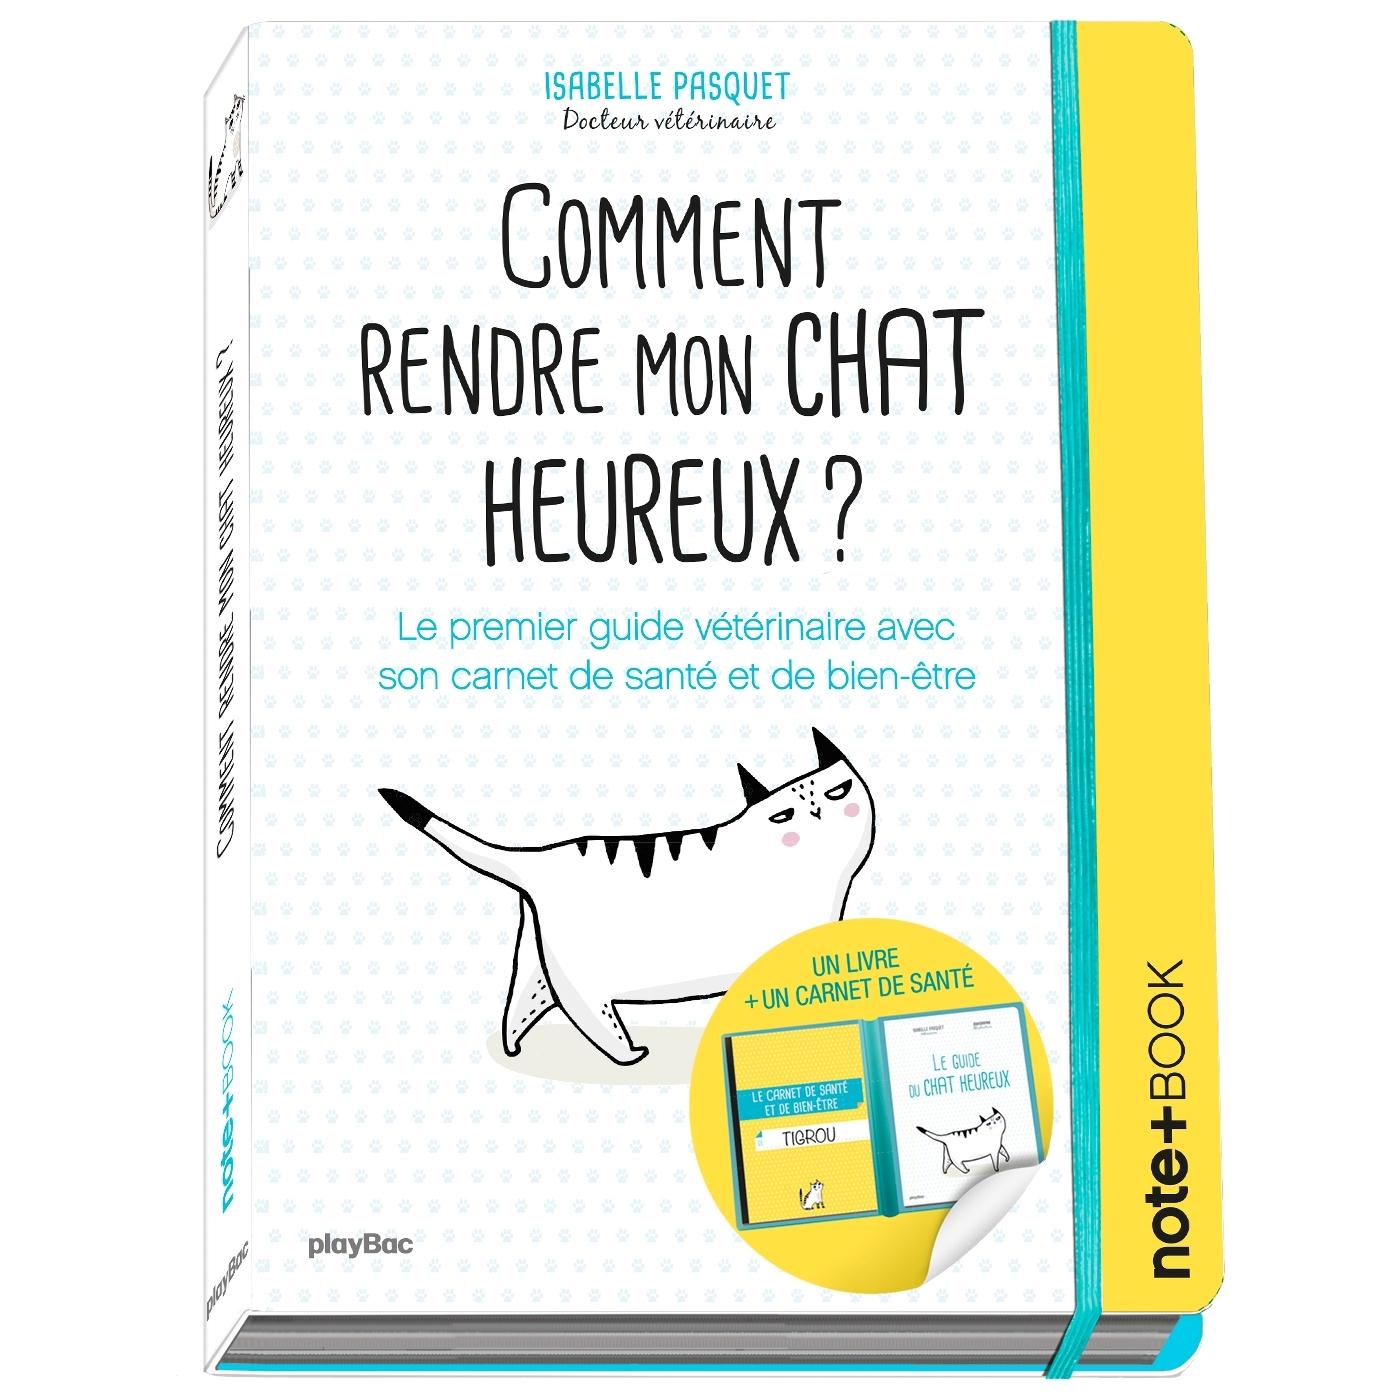 COMMENT RENDRE MON CHAT HEUREUX ? NOTE+BOOK